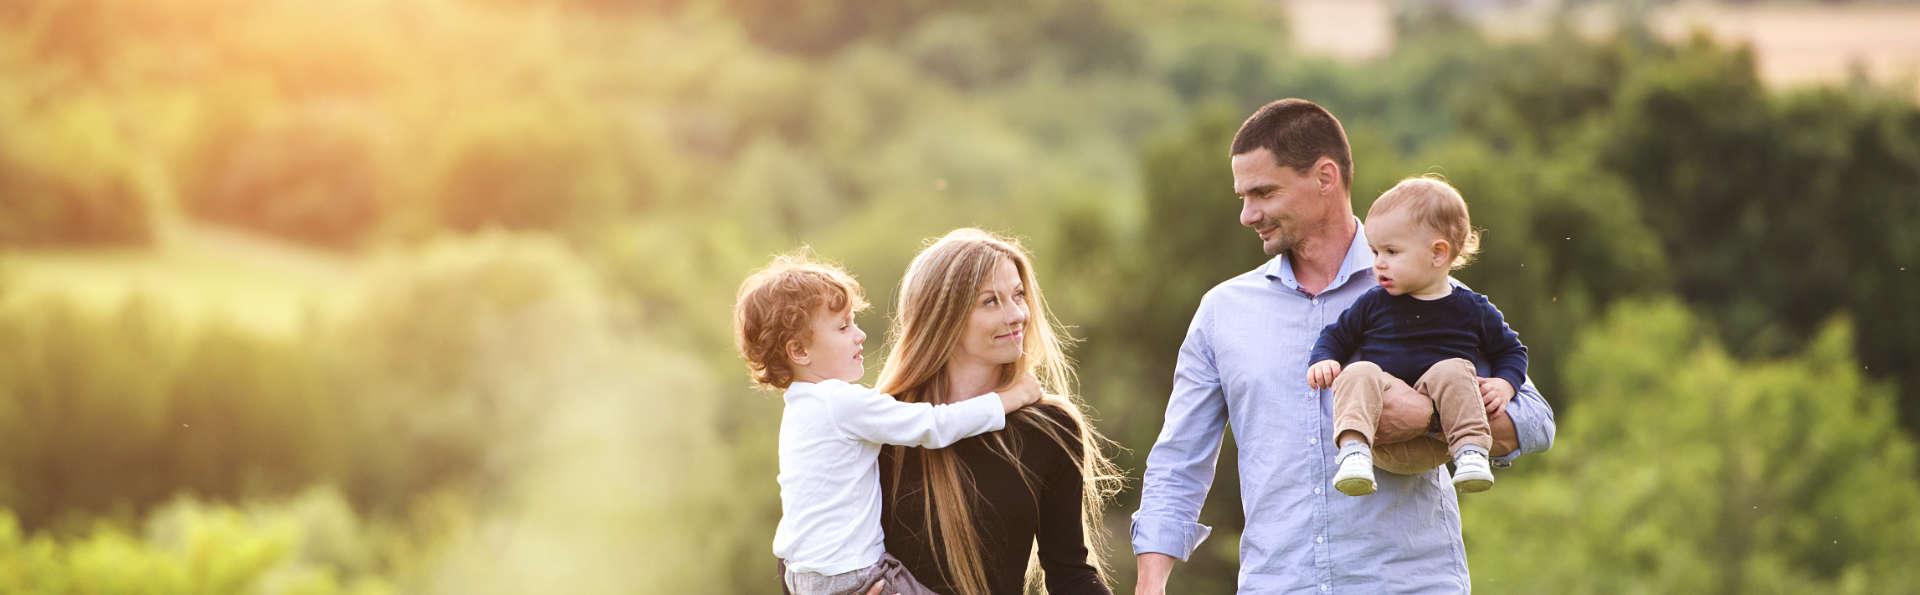 smiling family while walking